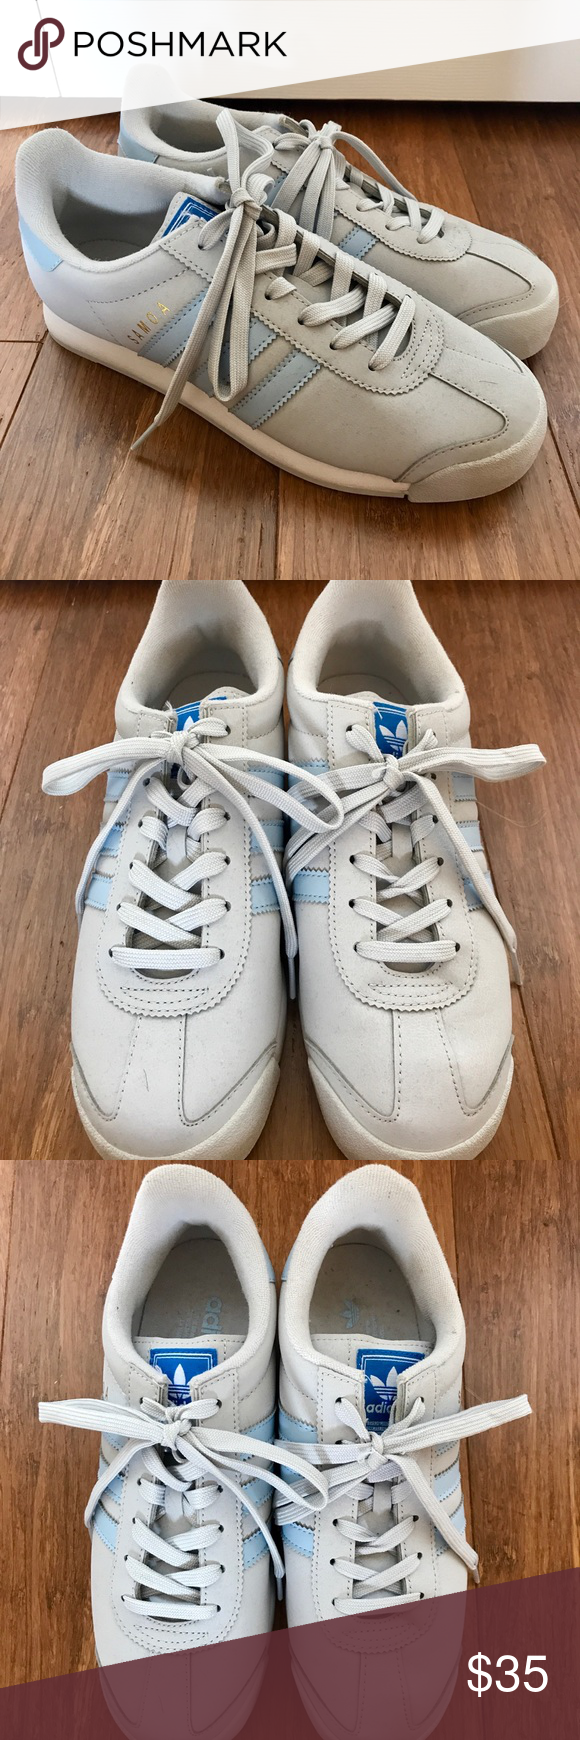 adidas samoa scarpe pinterest adidas